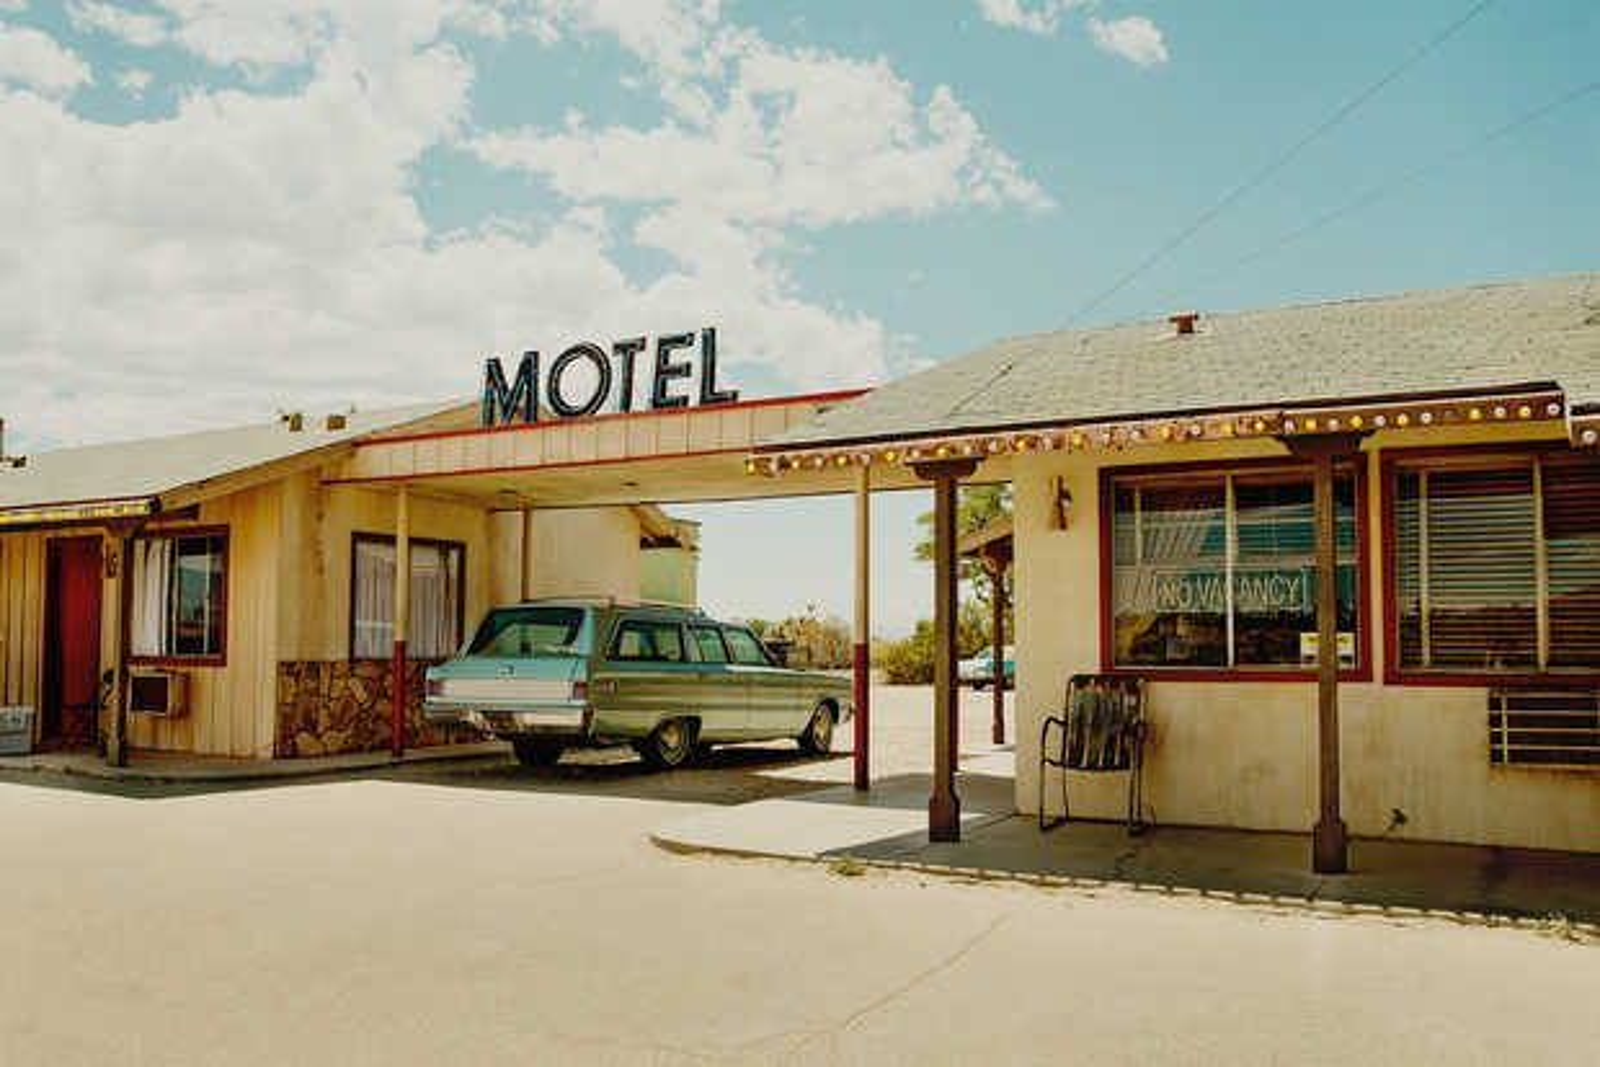 Motel - Sarah Johanna Eick